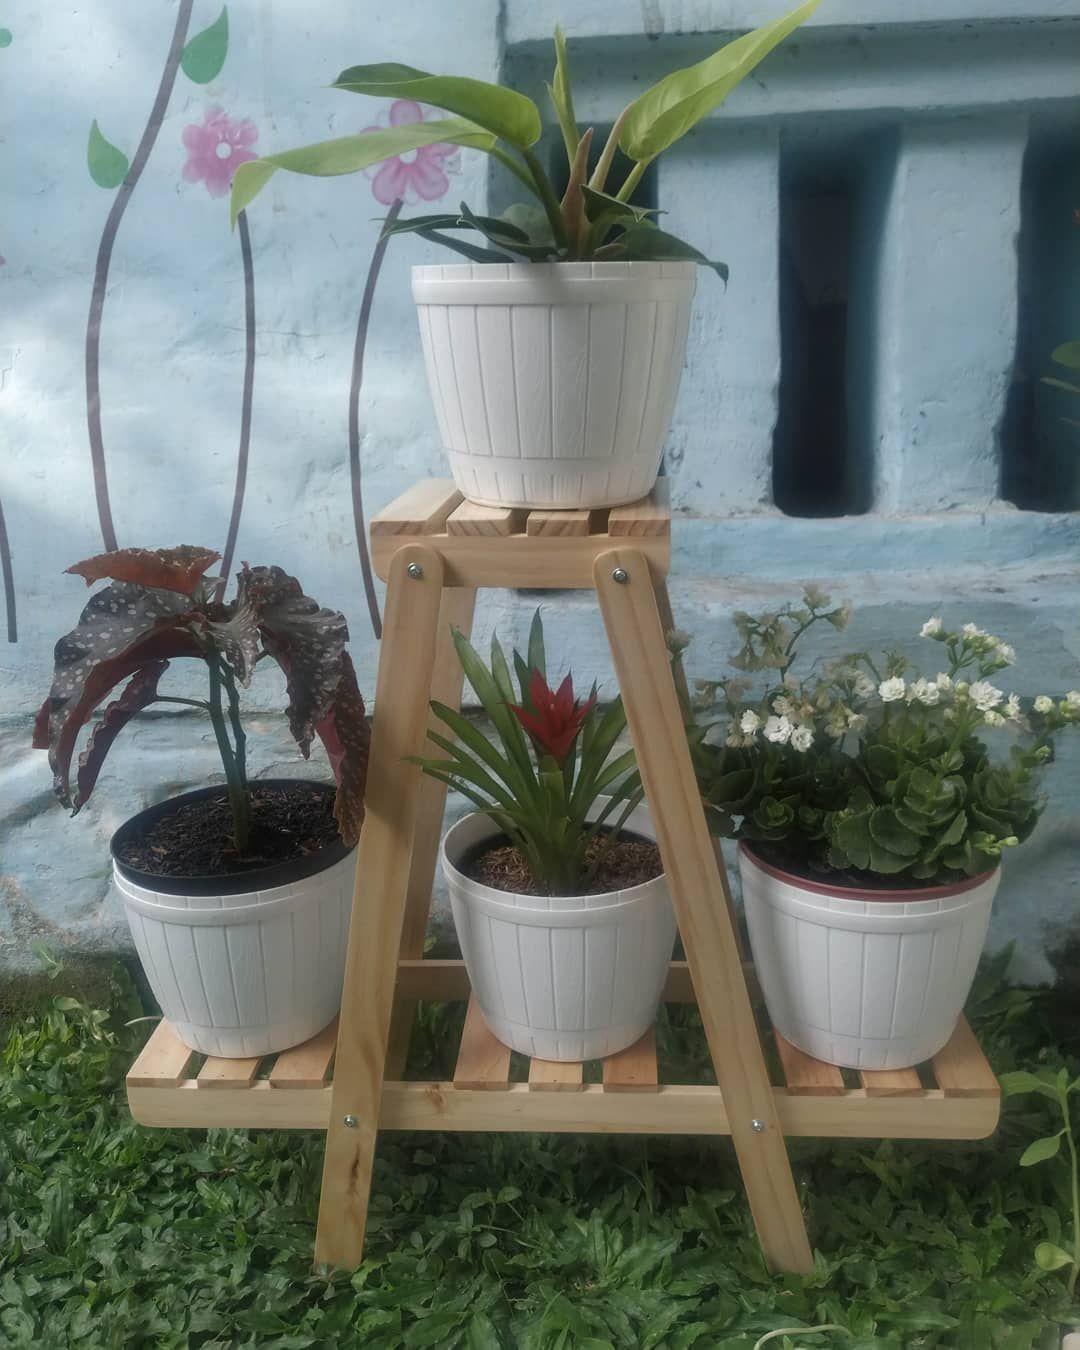 Rak Bunga 85rb Bahan Kayu Pinus Uk P55cm L16cm T50cm Homedecor Homedecorkediri Homedecorlover Rakbunga Rakbungakayu Pot Bunga Meja Pot Bunga Rak Pot Bunga